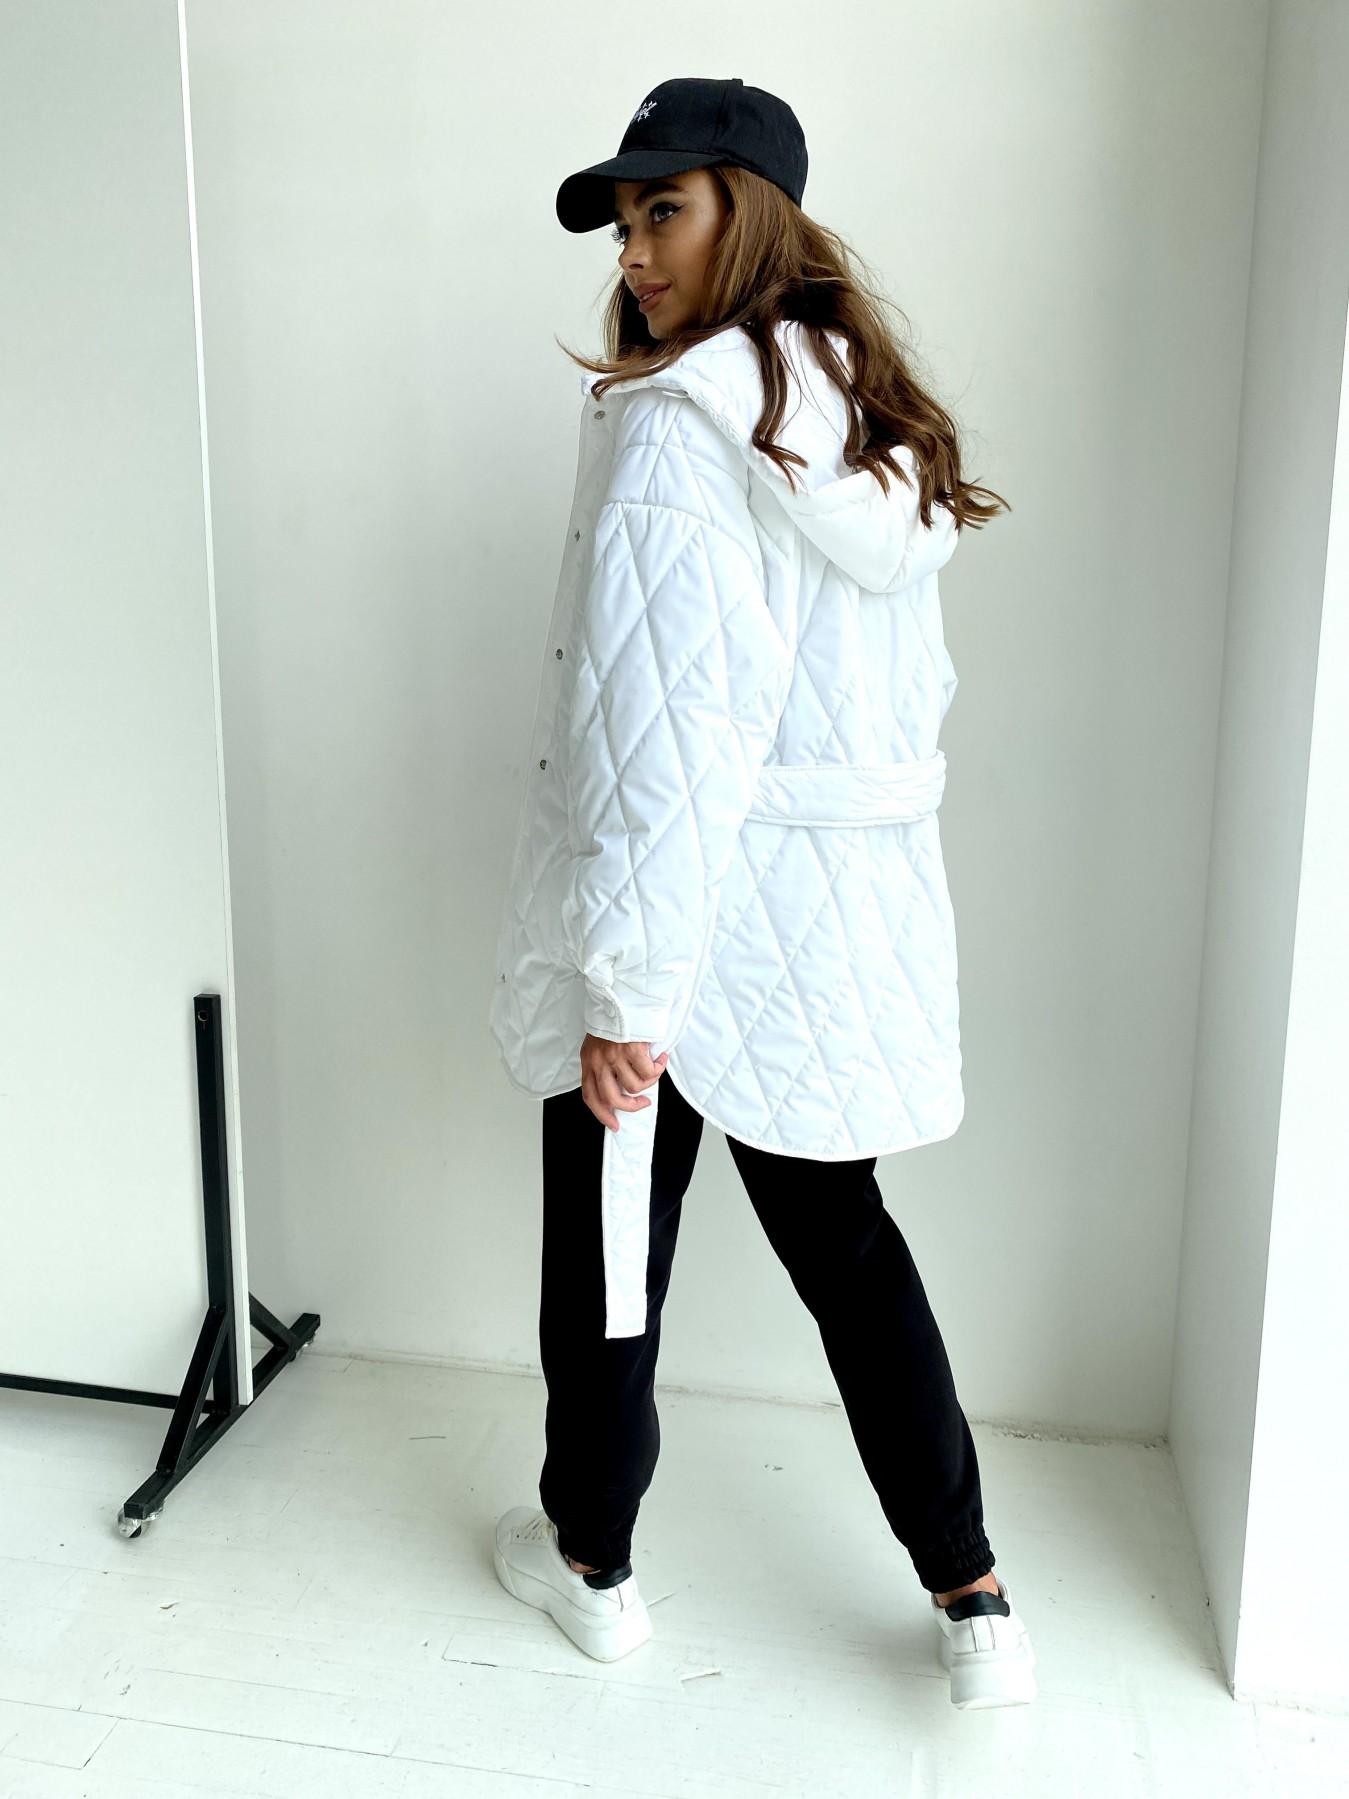 Пазл стеганая куртка из плащевки 11764 АРТ. 48509 Цвет: Молоко 12 - фото 1, интернет магазин tm-modus.ru